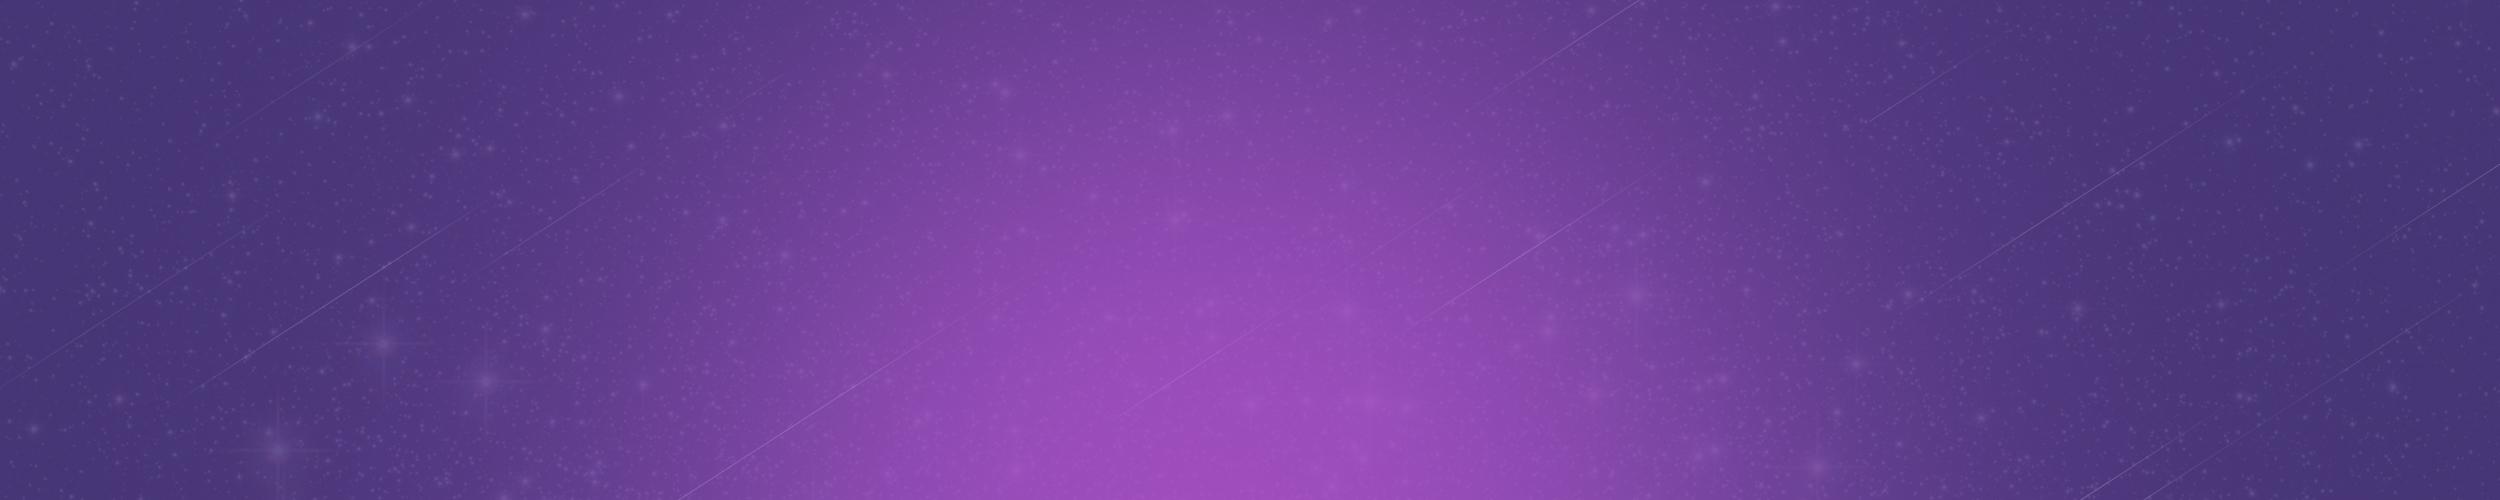 purple-stars